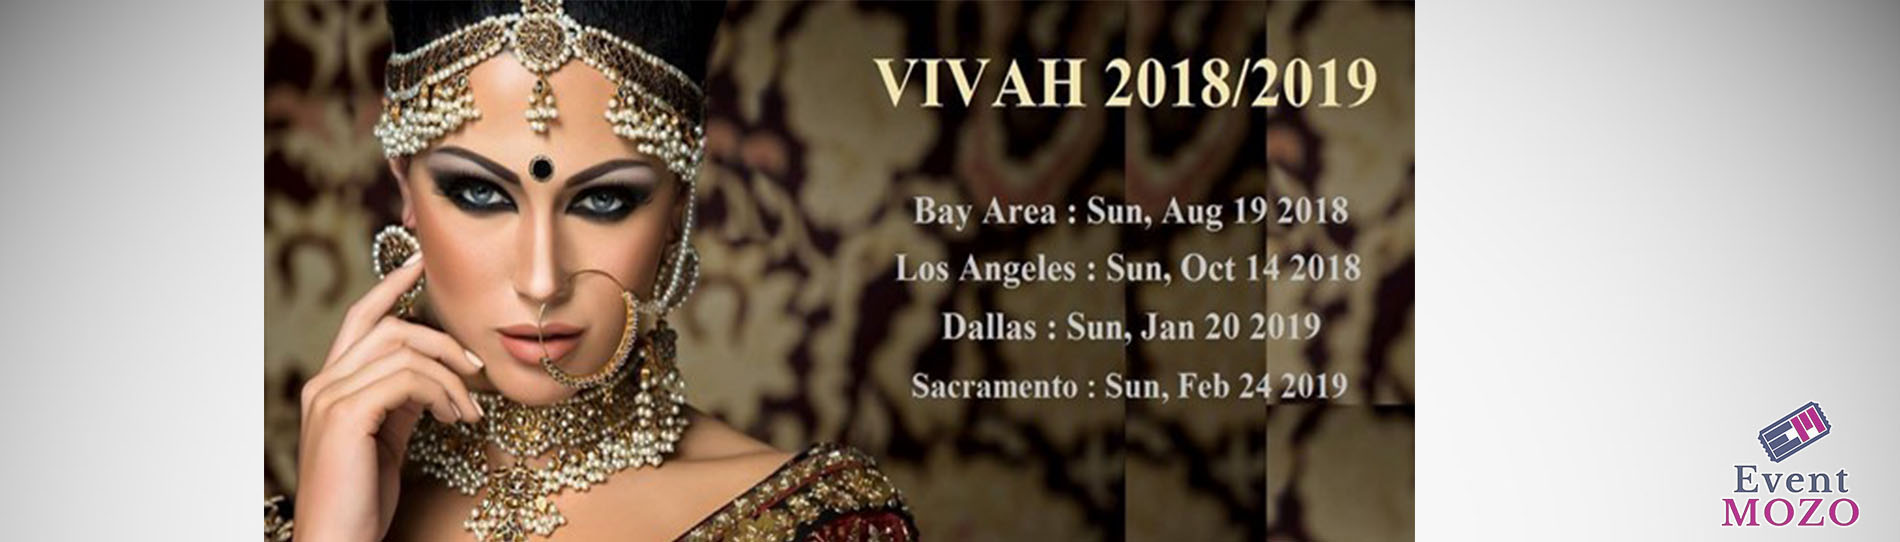 EventMozo Vivah 2018 Bridal Expo Los Angeles